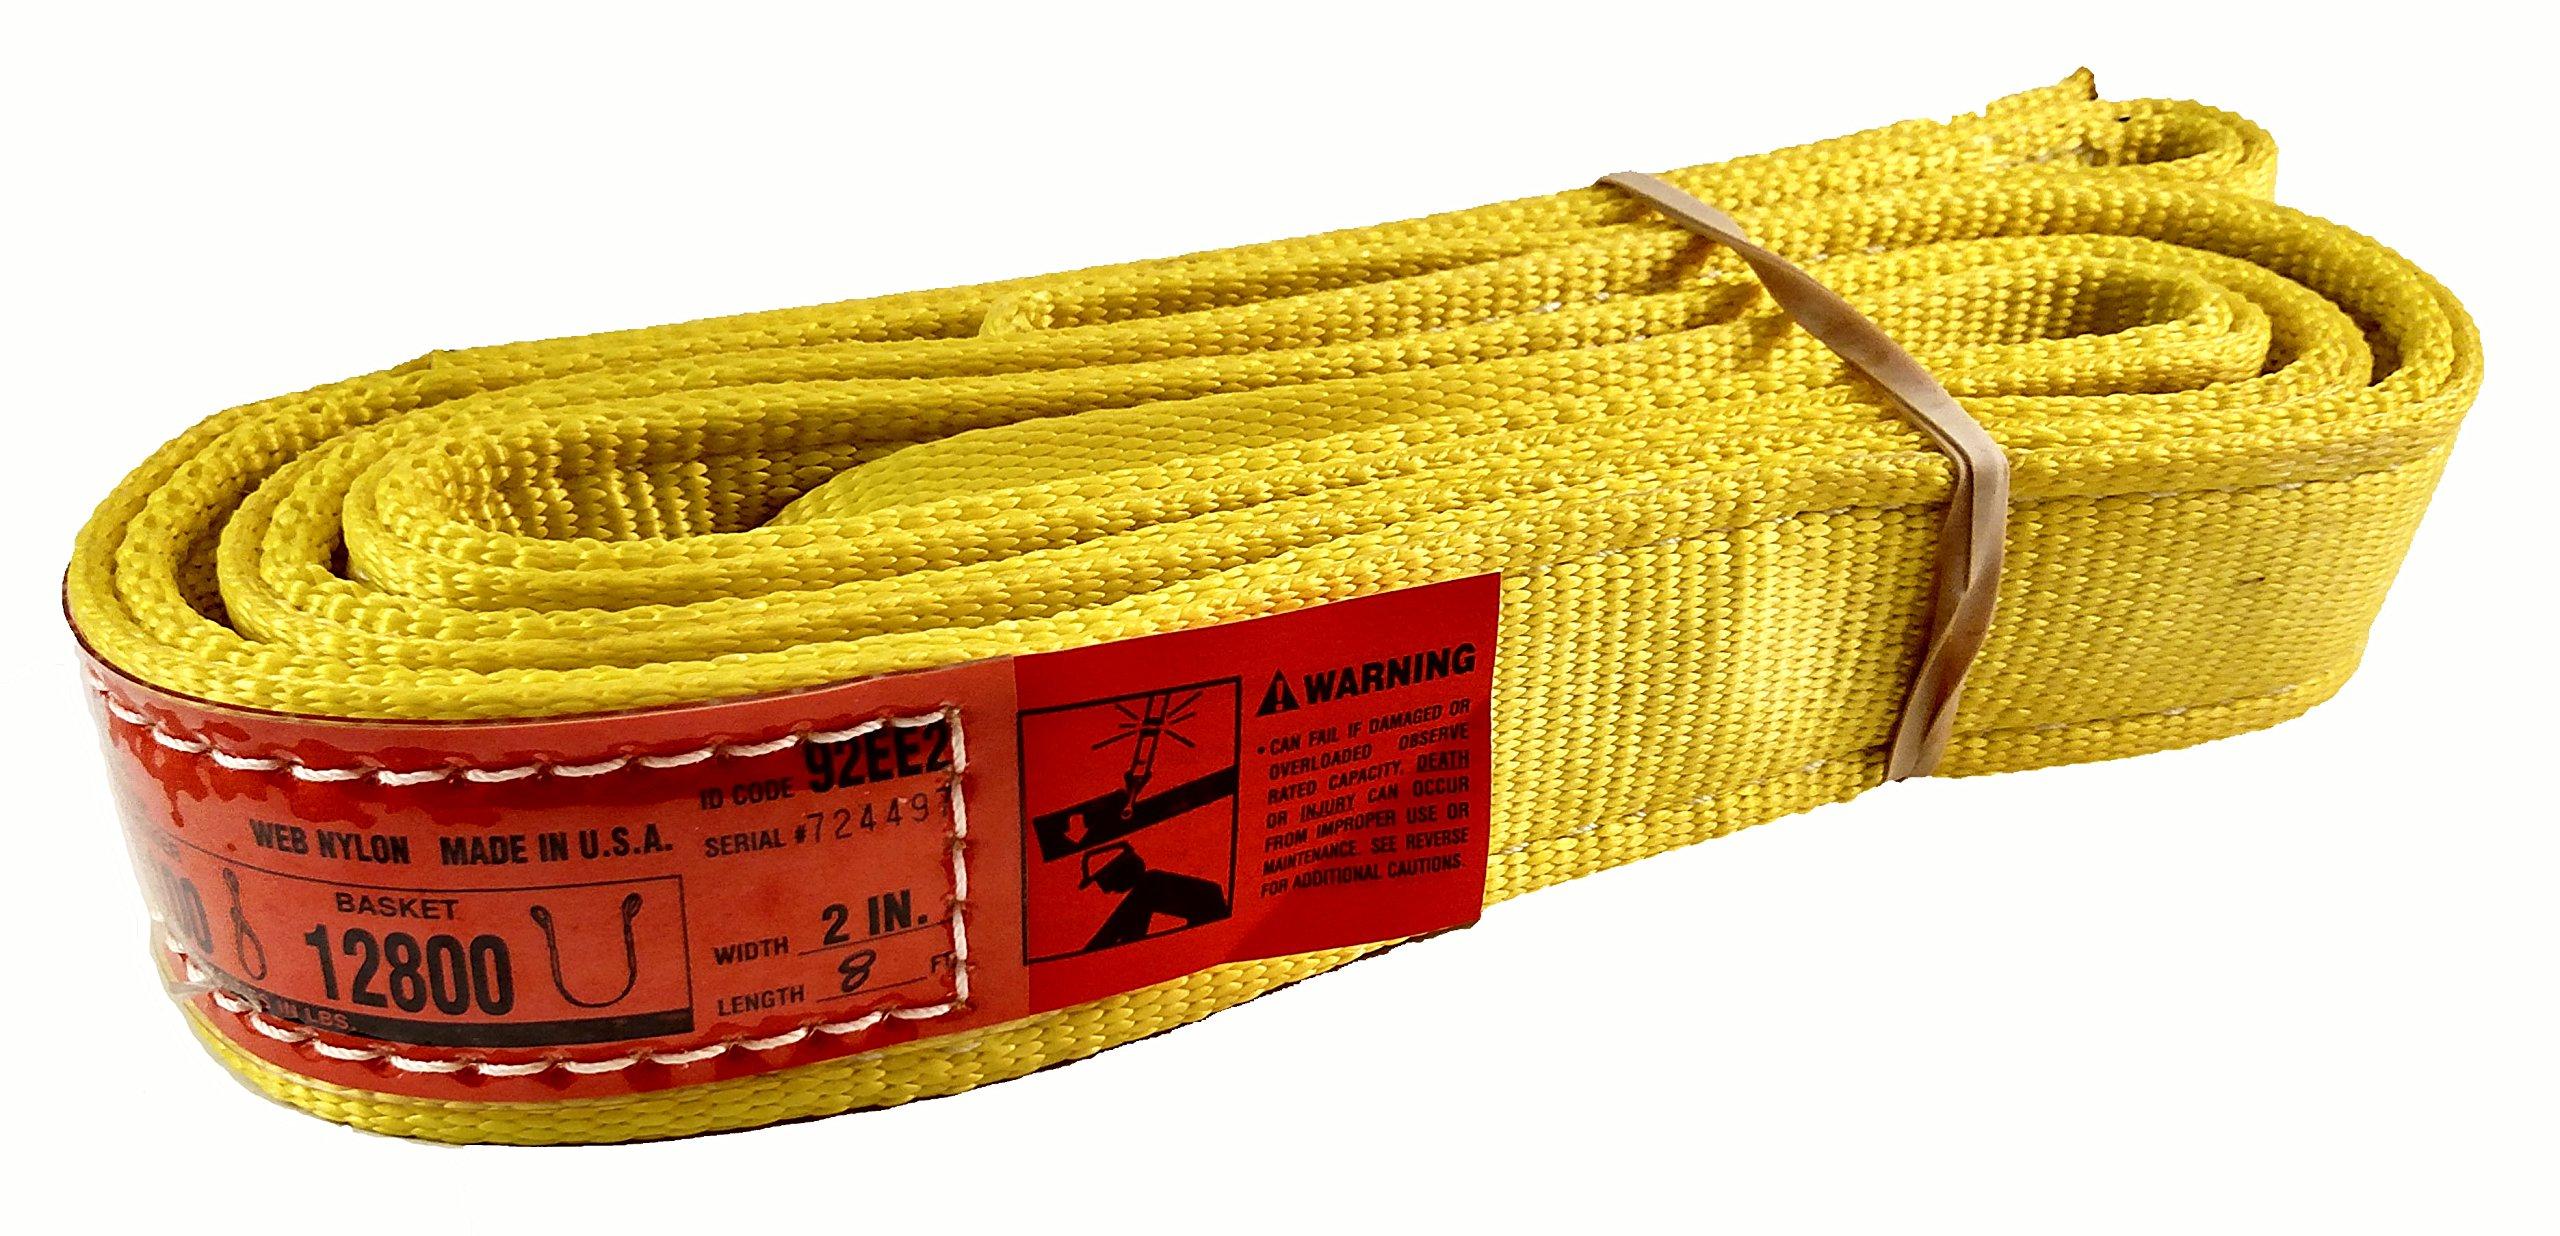 DD Sling (USA Made). 2'' wide X (4' to 20' lengths) in Listing! 2 Ply Twisted Eye, Nylon Lifting Slings, Eye & Eye, Heavy Duty (900 webbing), 6,400 lbs Vertical, 5,100 Choker, 12,800 Basket Load Capacity (2inX8ft)